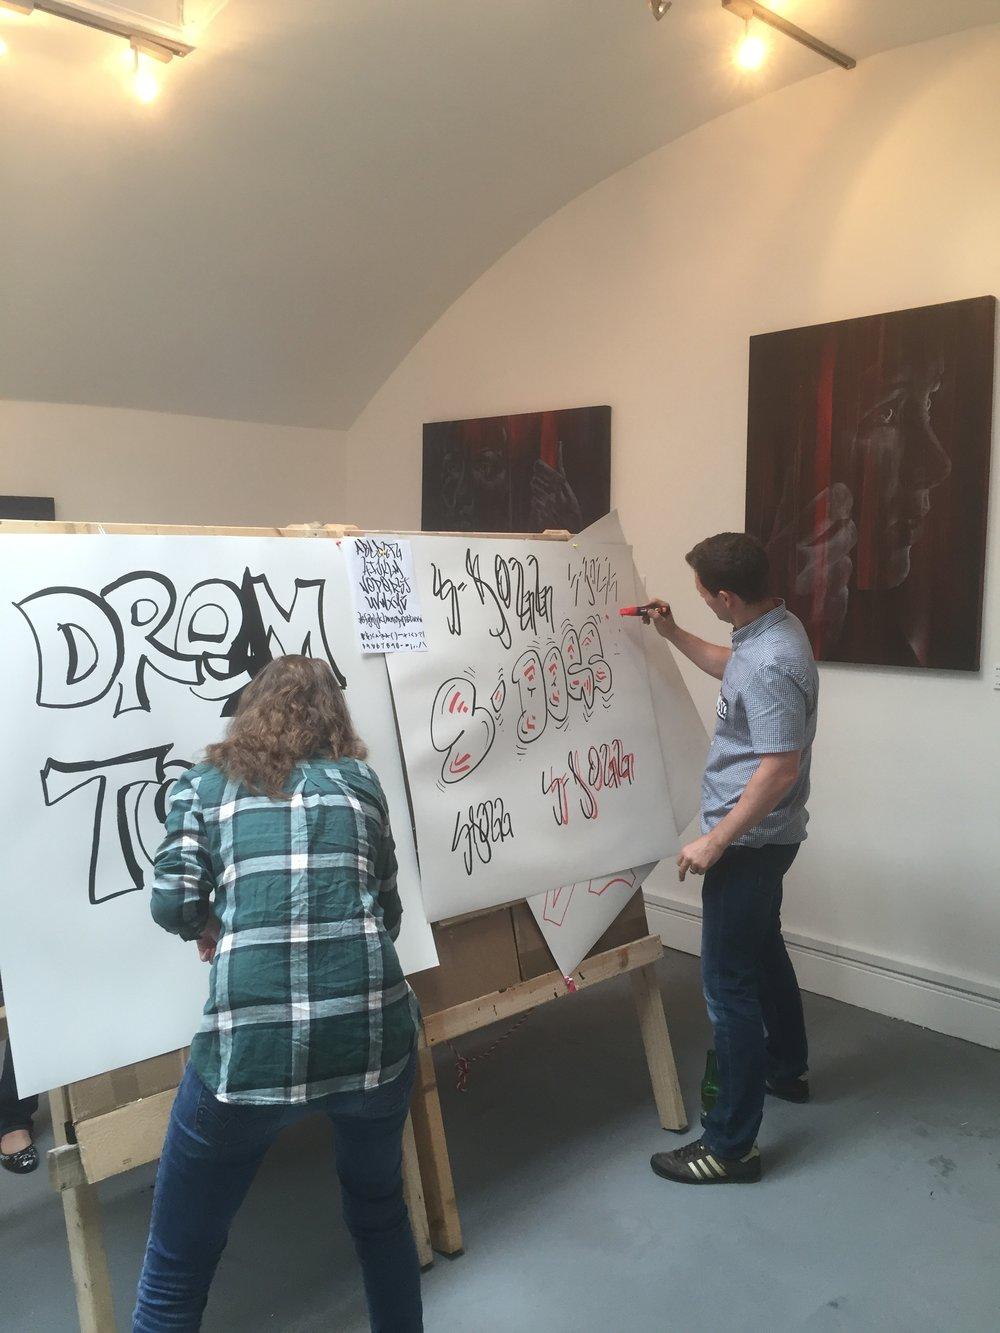 Google-Team-Bulding-Event-The-Kemp-Gallery-Dublin-Ireland-15.JPG